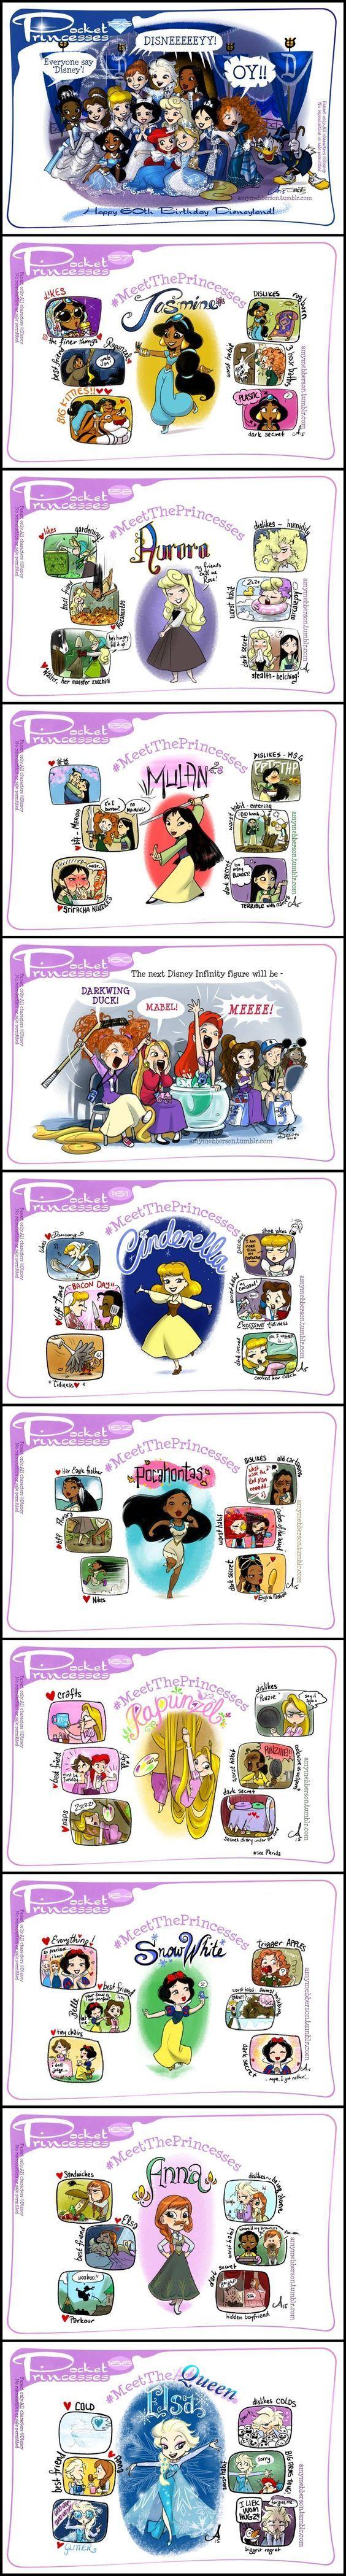 Pocket Princesses (Part 16) by Amy Mebberson: